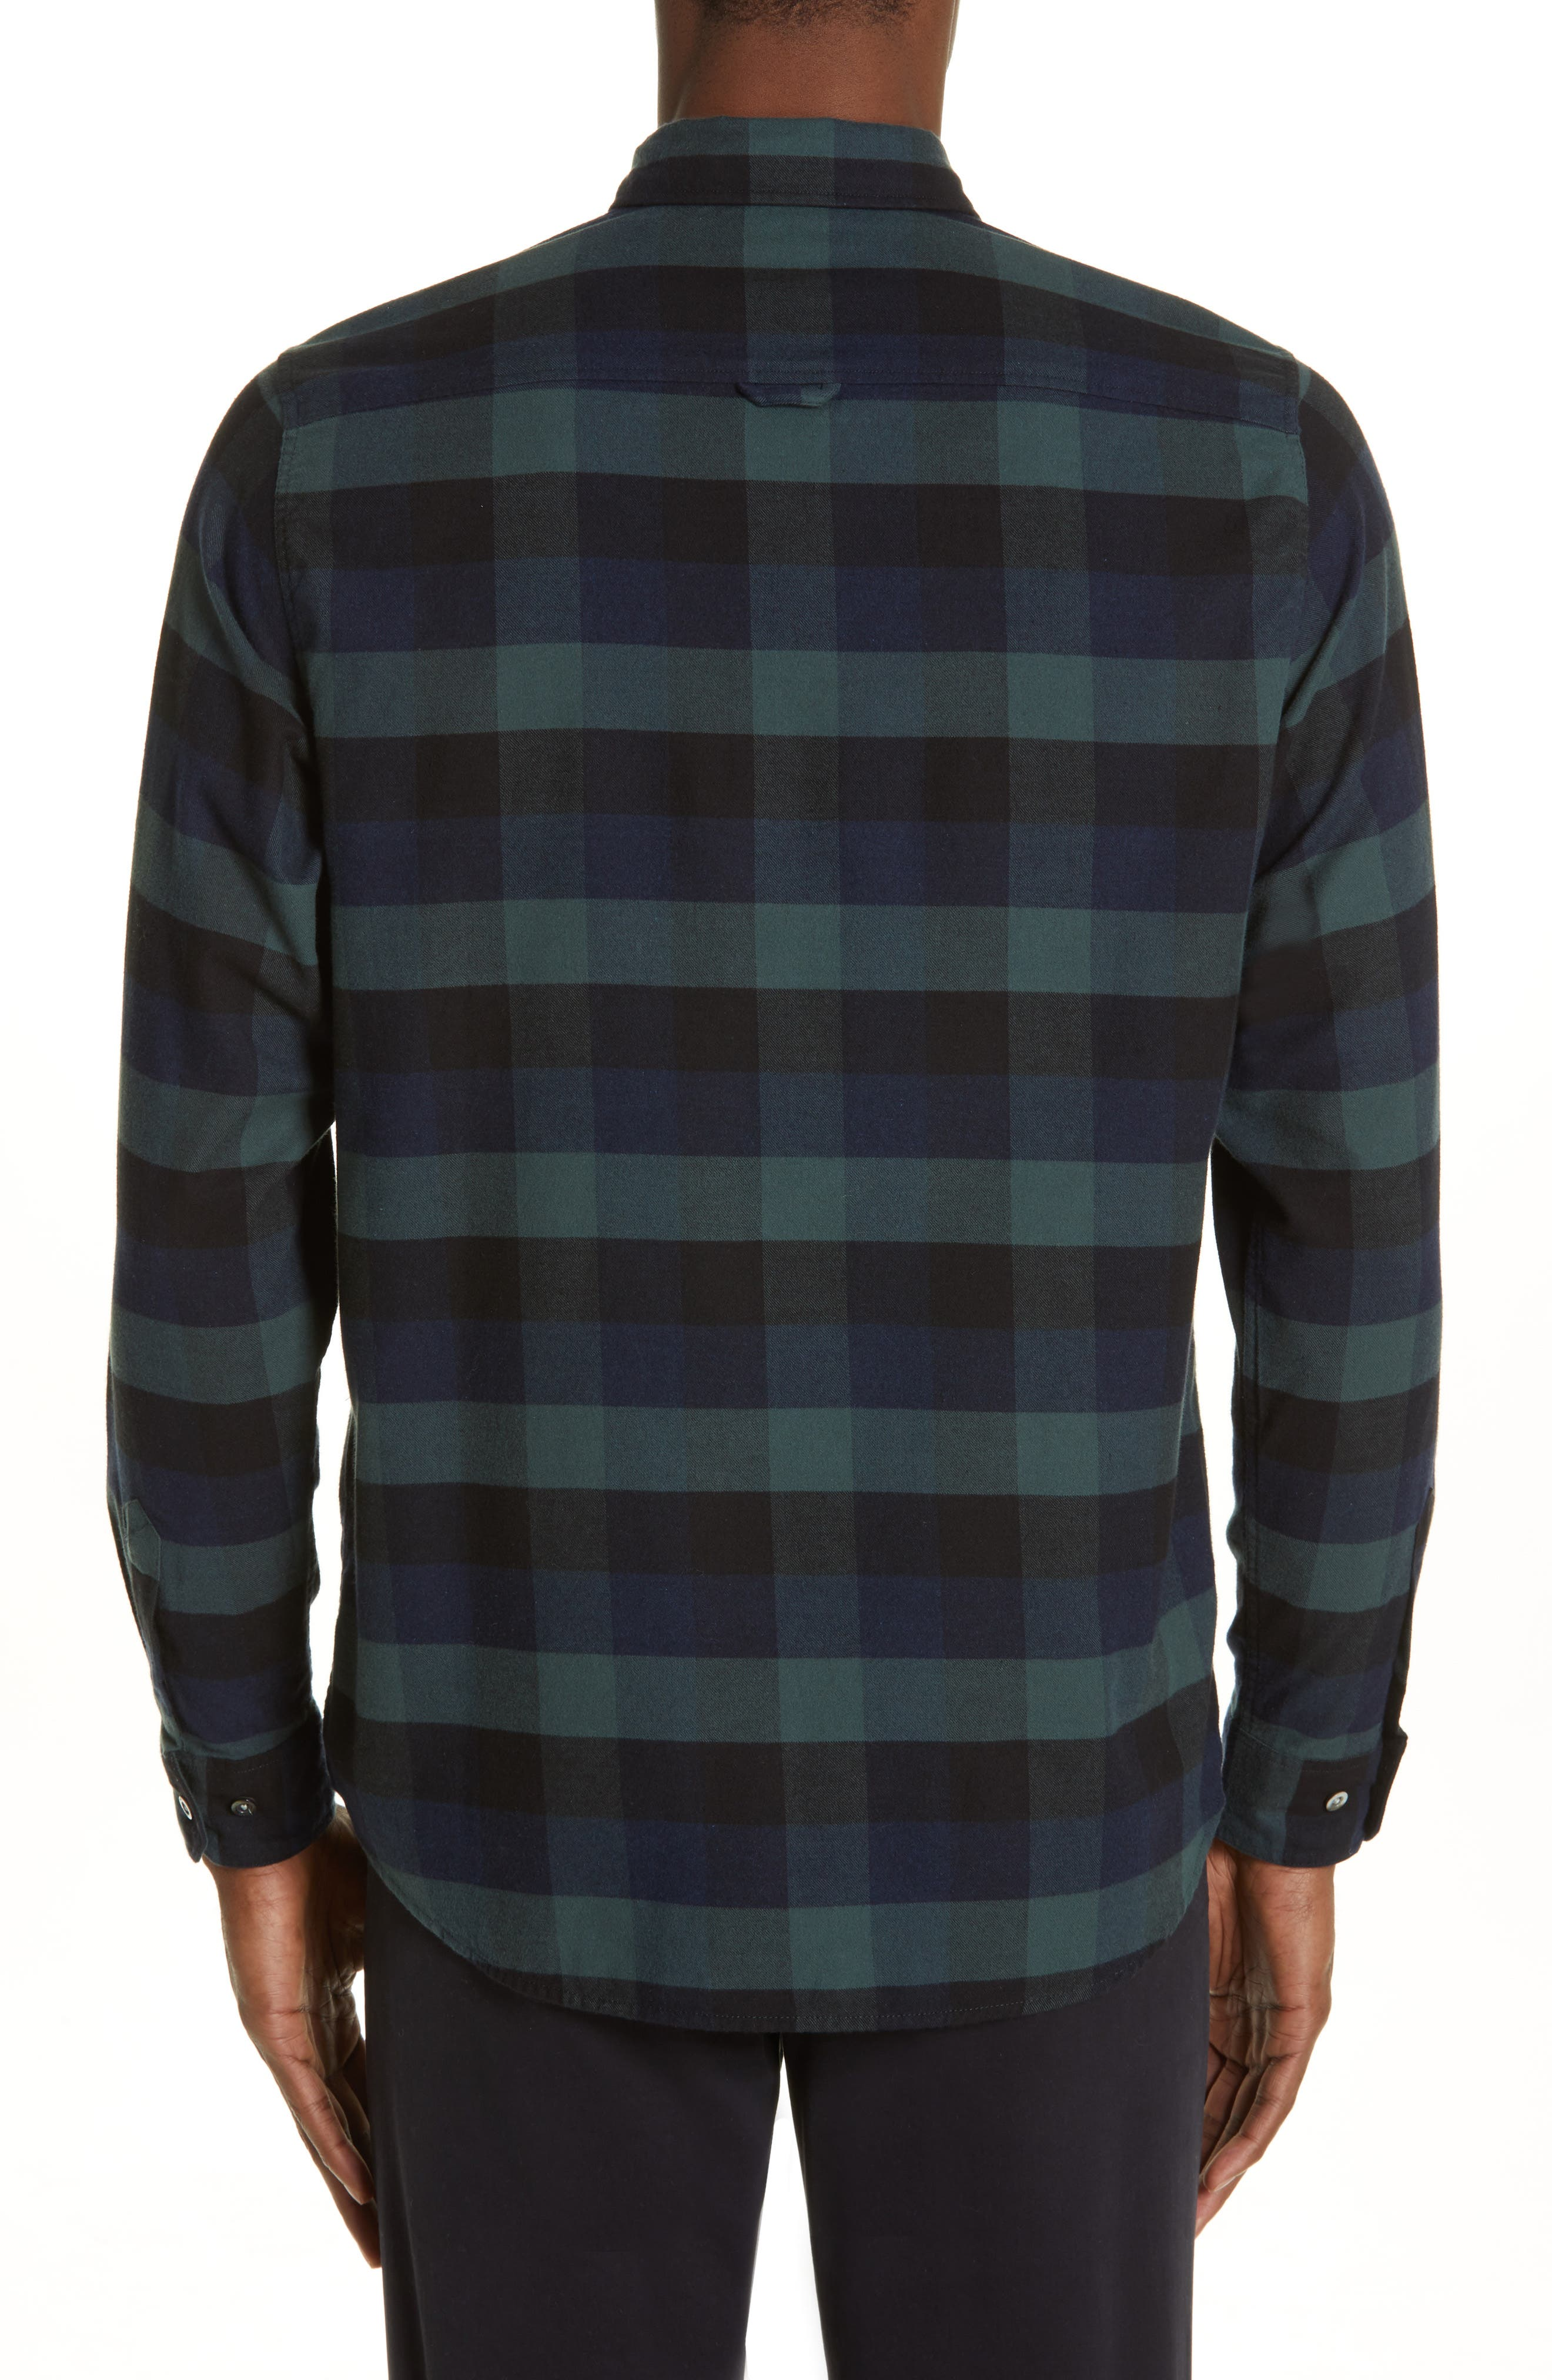 Villads Check Brushed Flannel Shirt,                             Alternate thumbnail 3, color,                             DARK NAVY